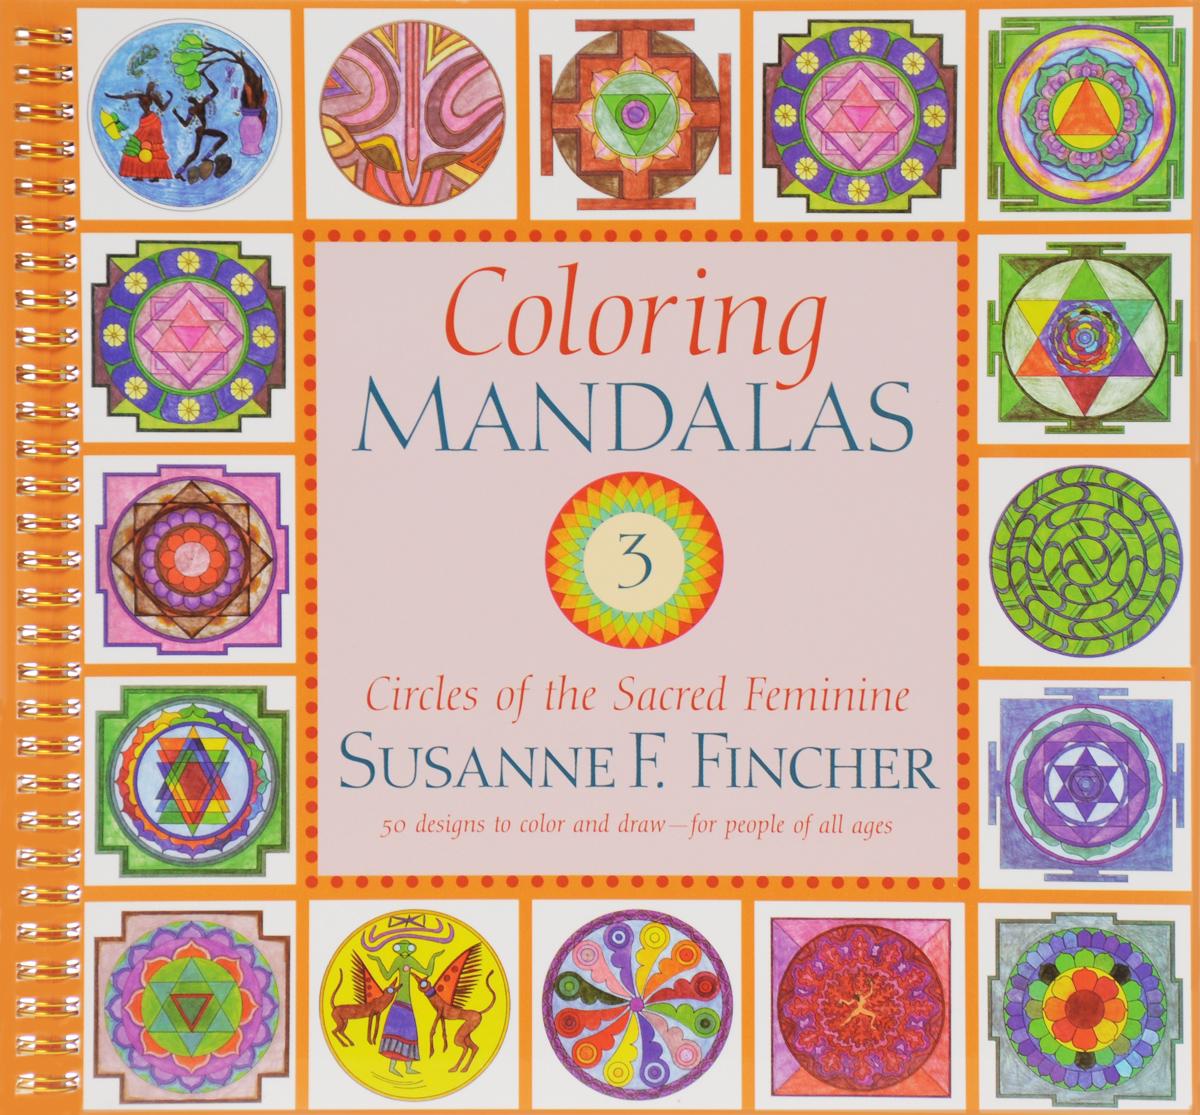 Susanne F. Fincher Coloring Mandalas 3: Circles of the Sacred Feminine sacred 3